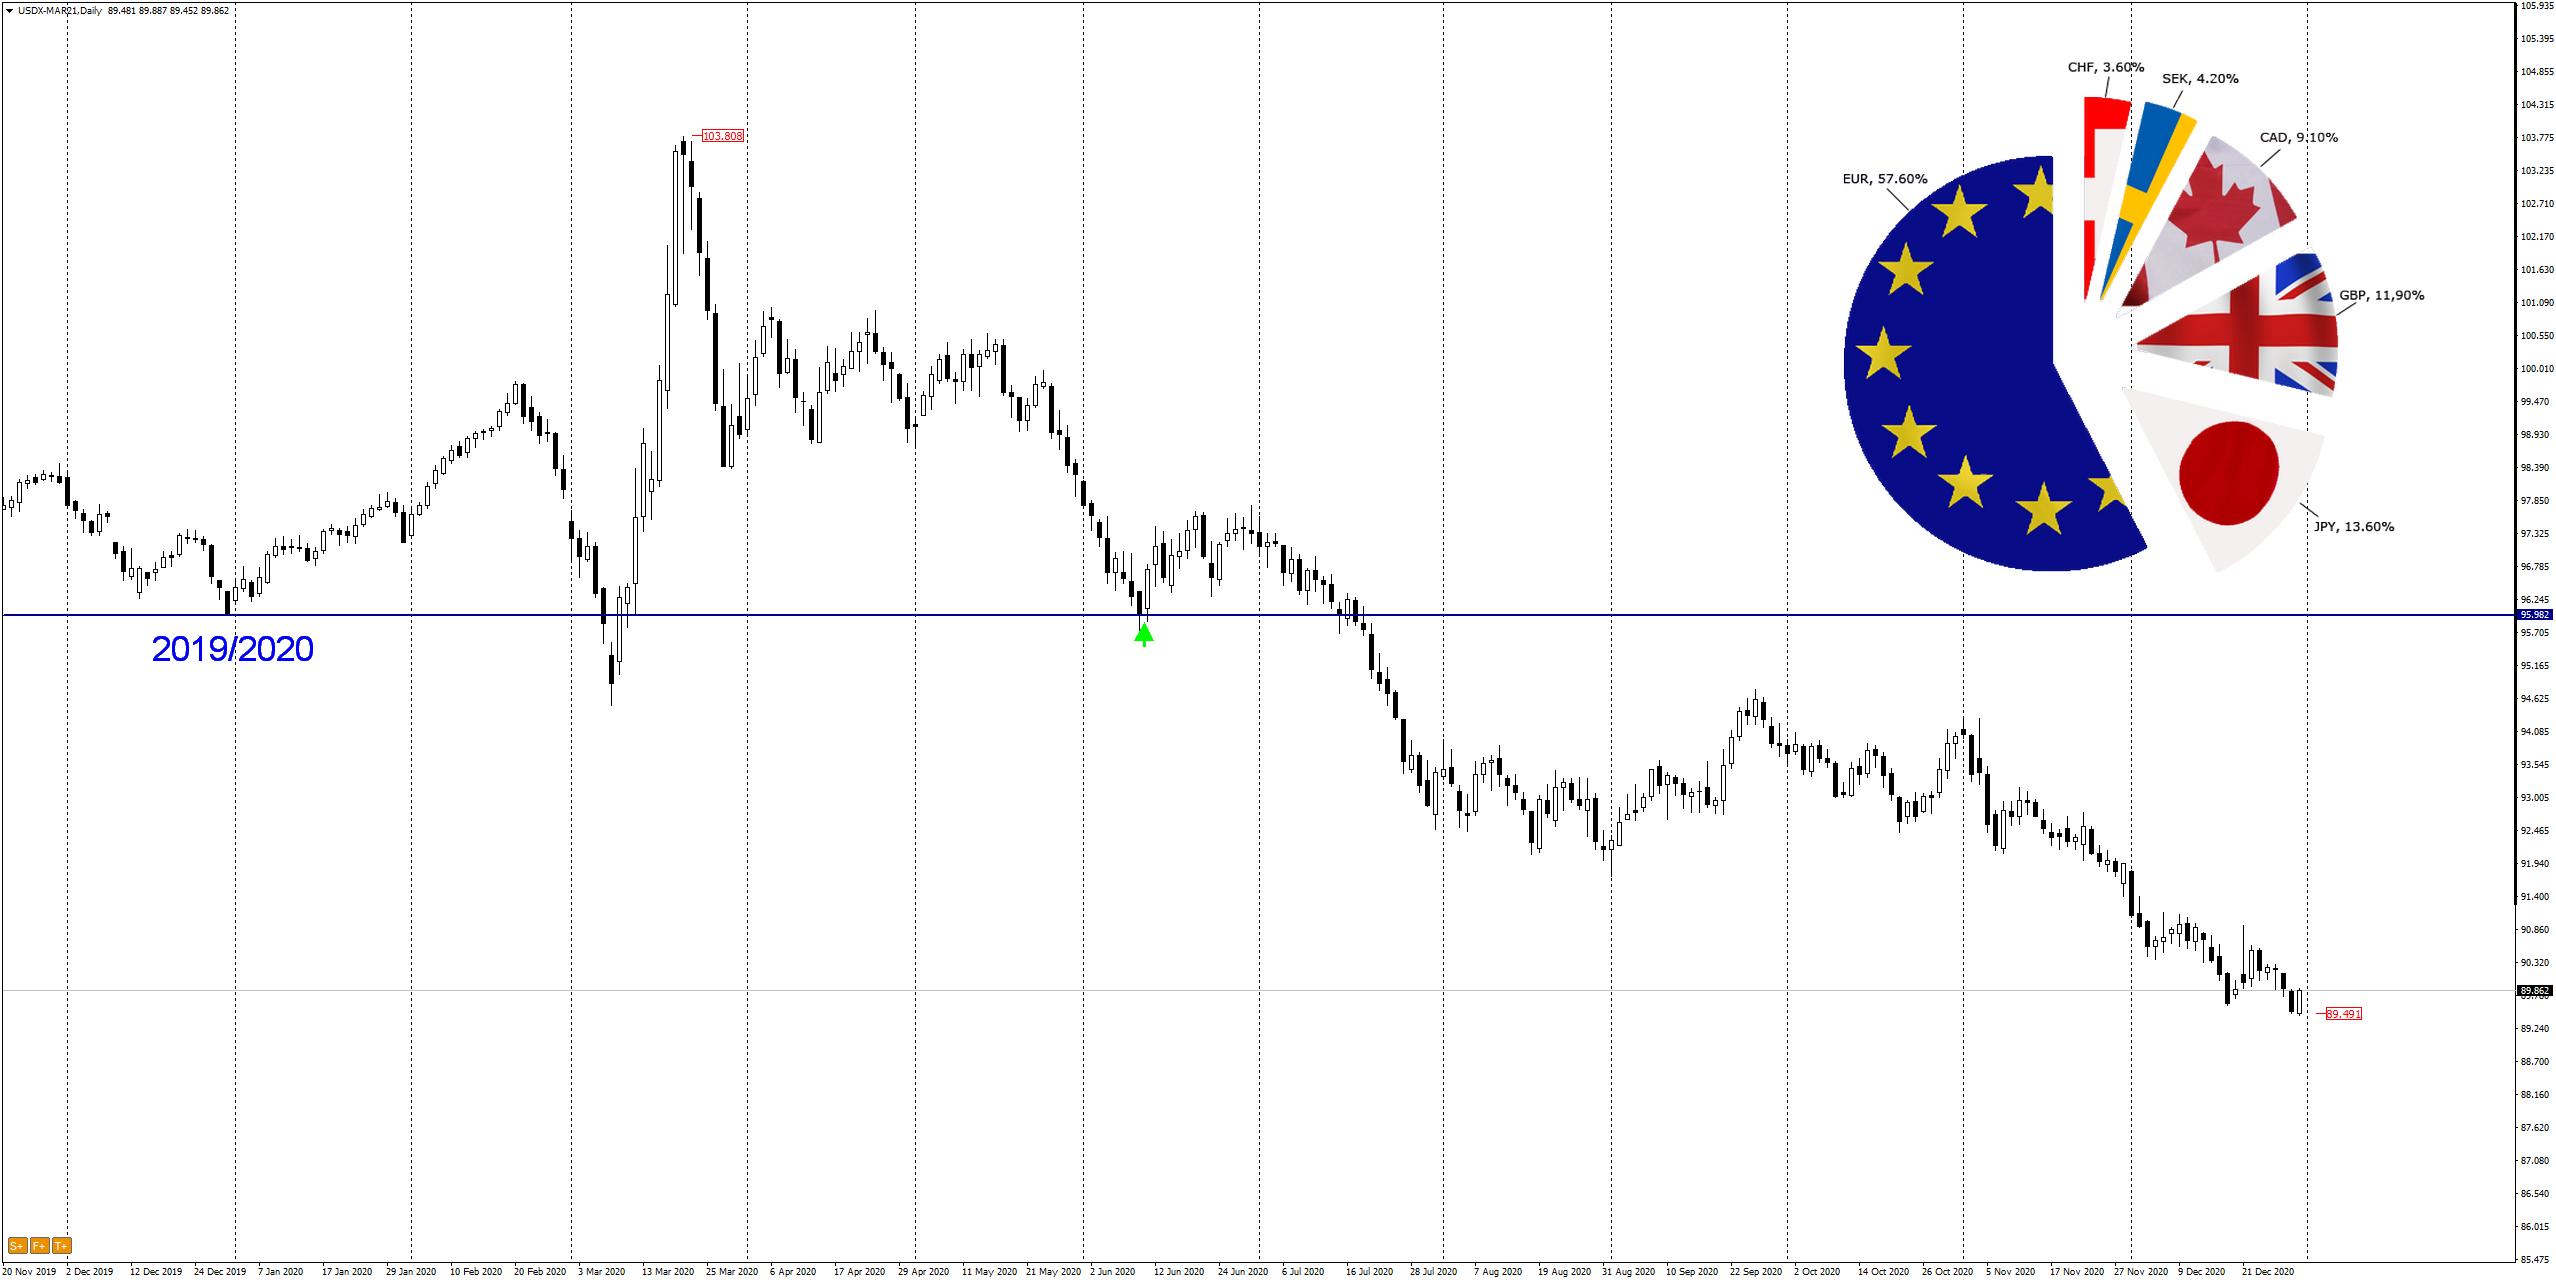 dollar index 2020